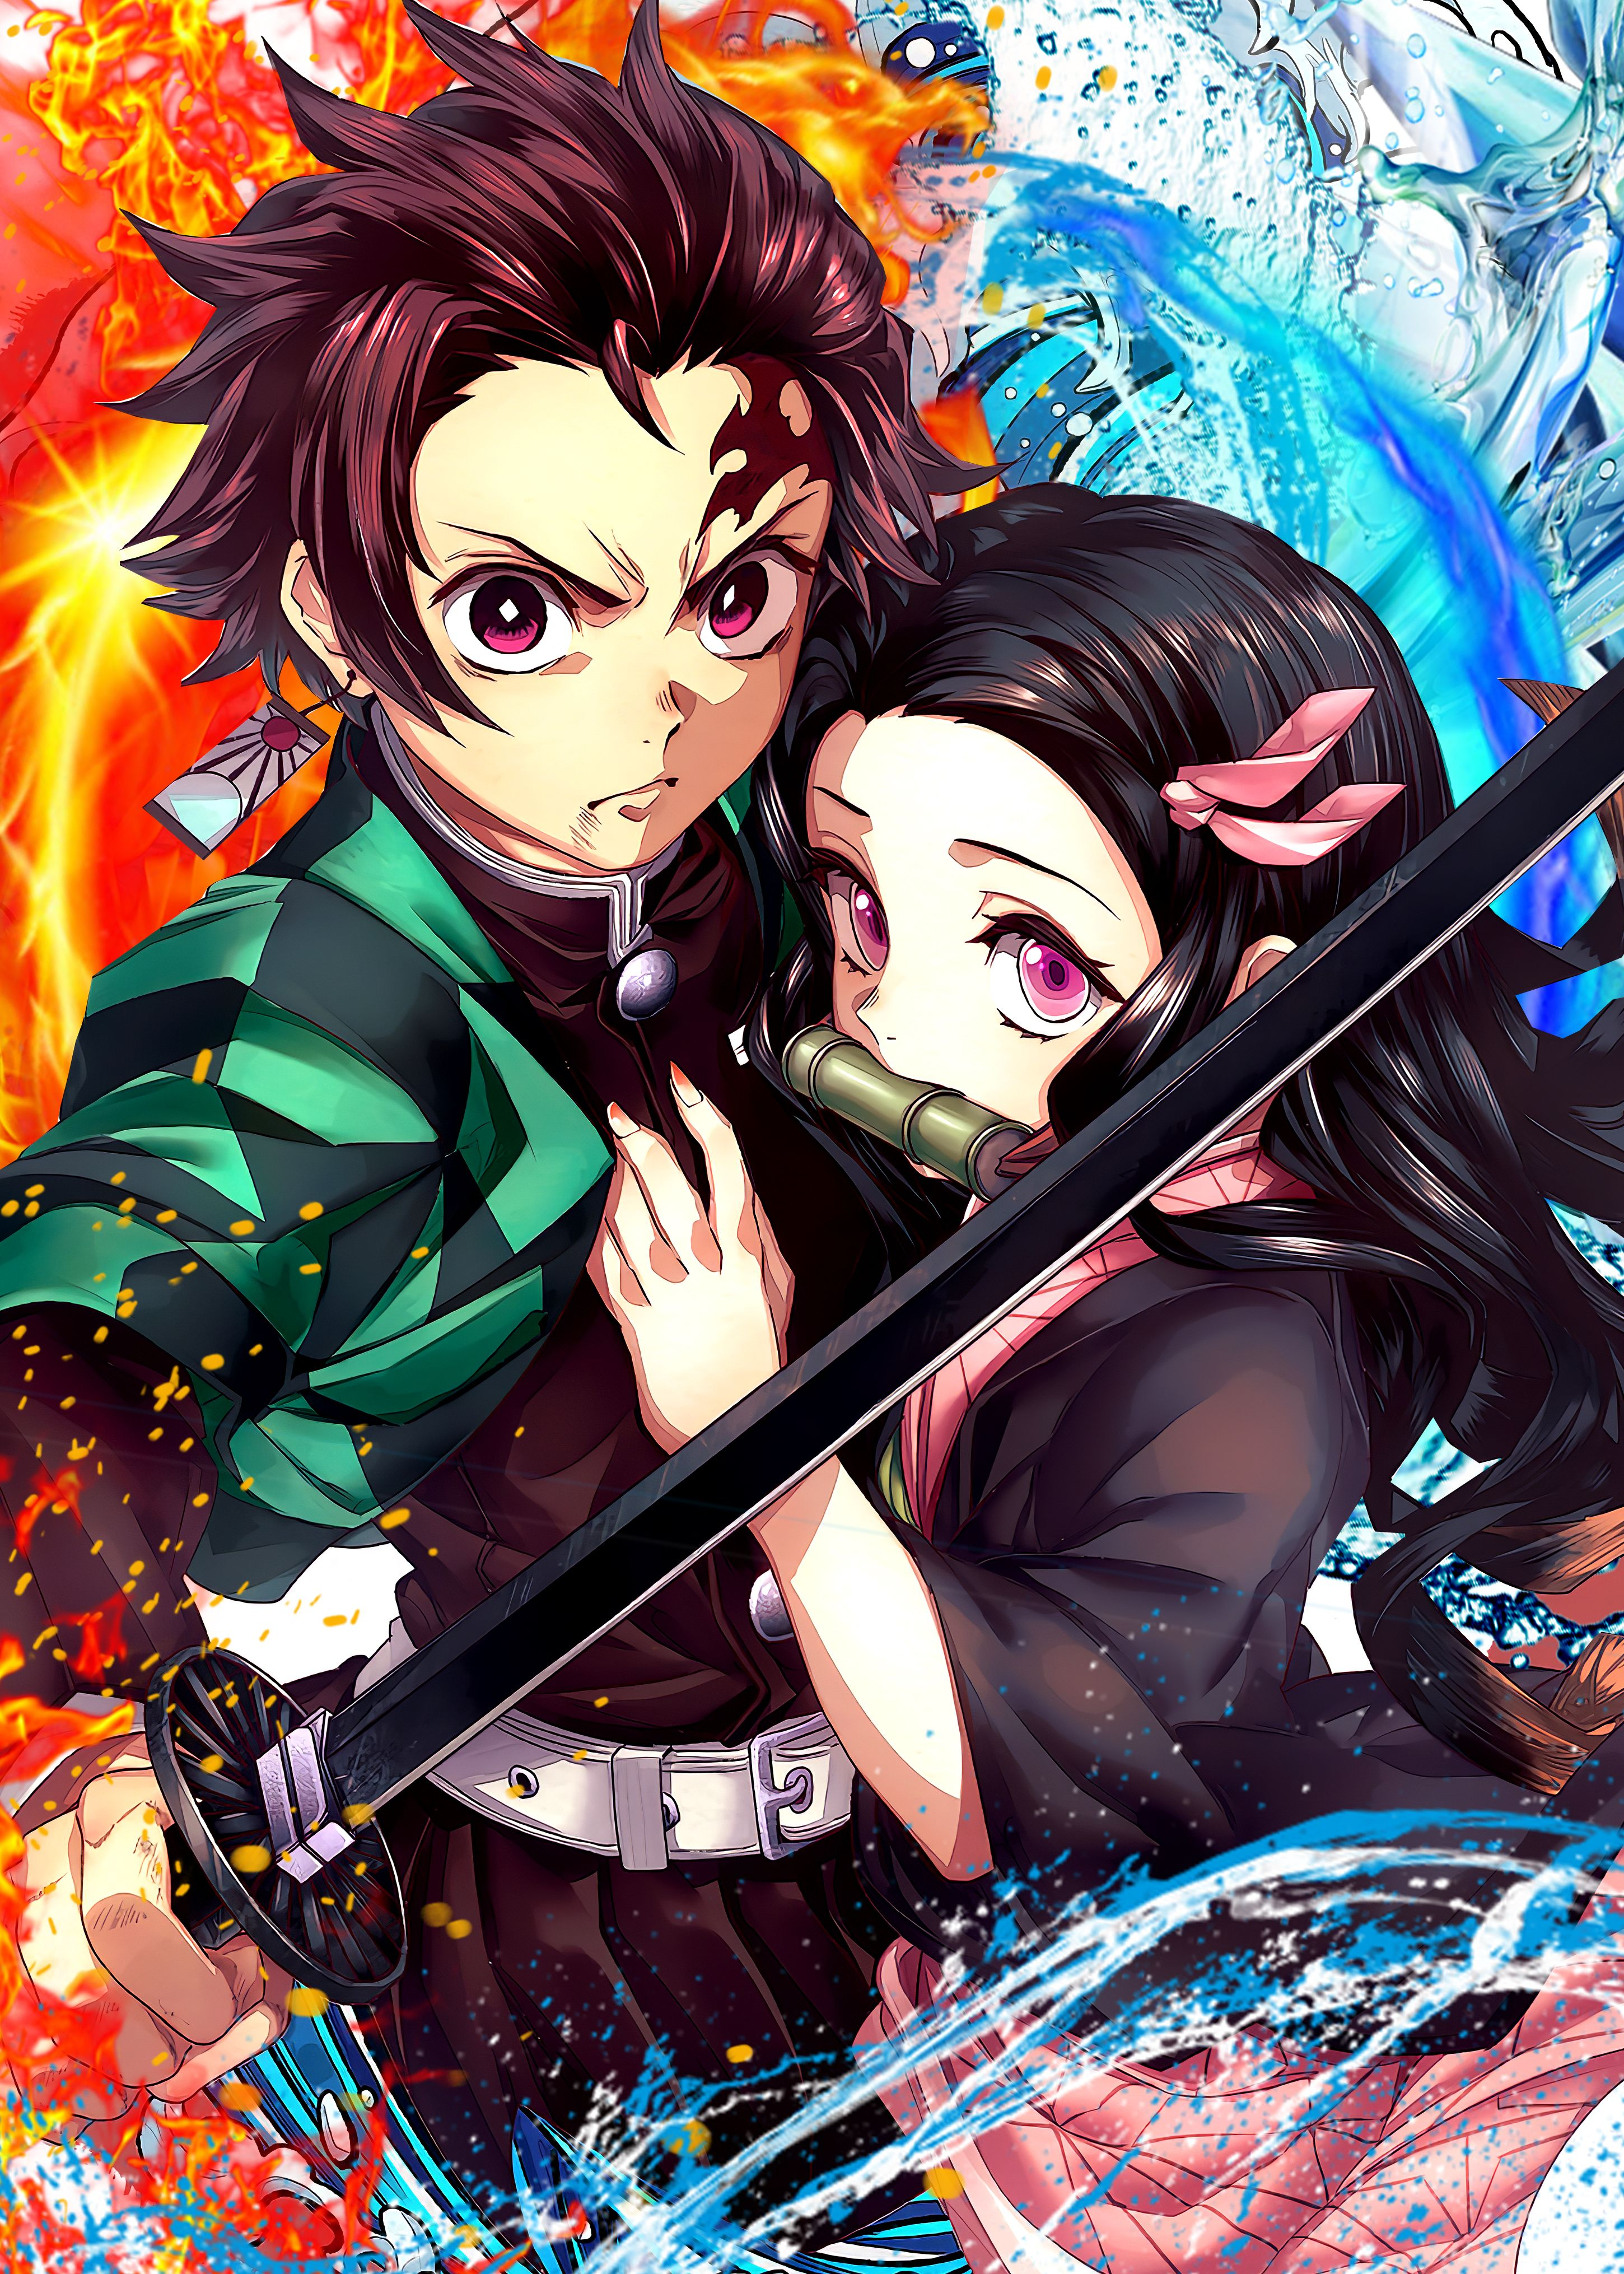 39 Demon Slayer (Tanjiro & Nezuko) Metal Poster in 2020